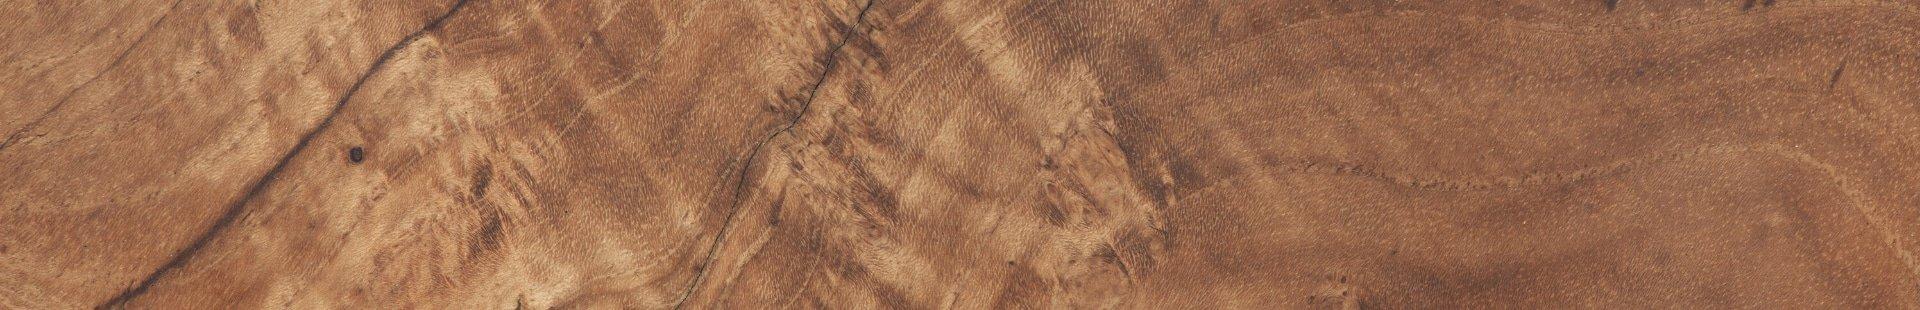 Pflege von Holz: Teakholz